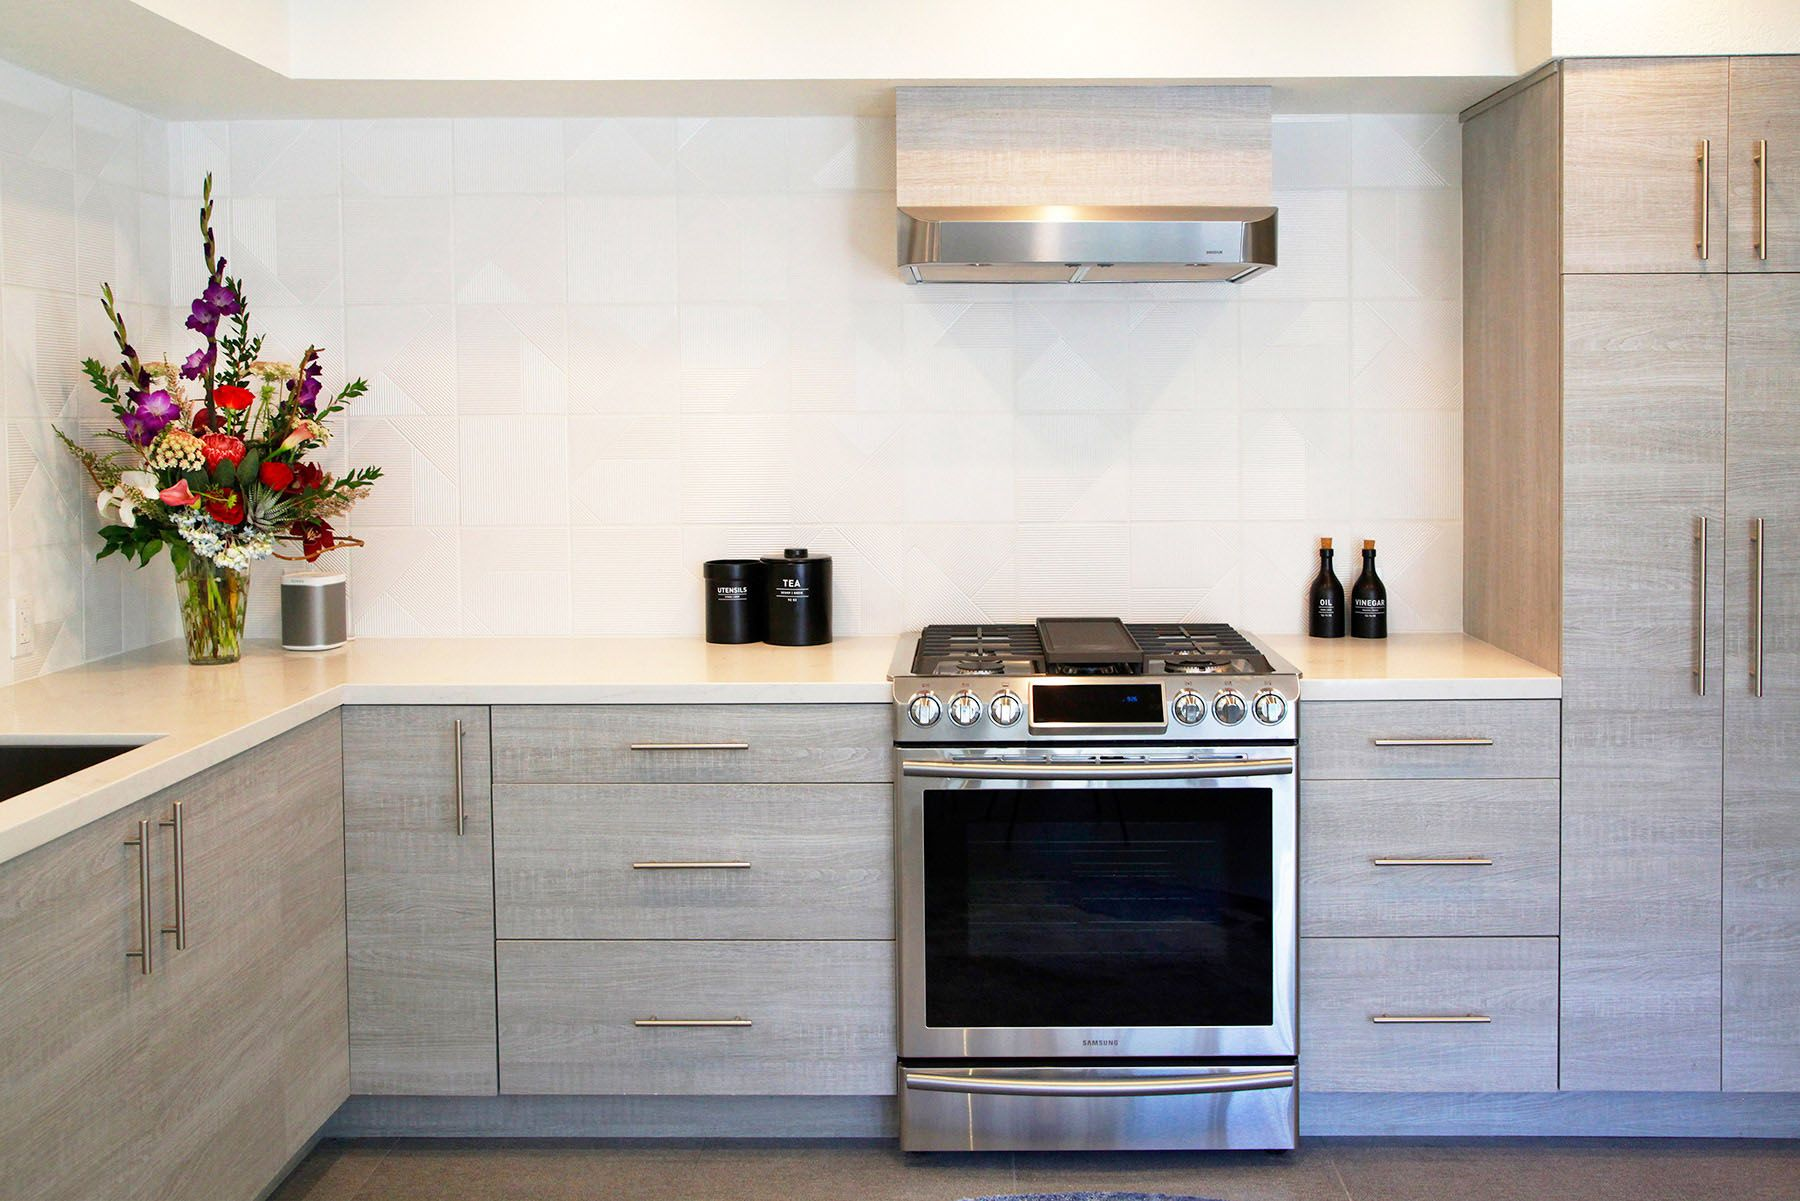 Kitchens & Dining 7.jpg